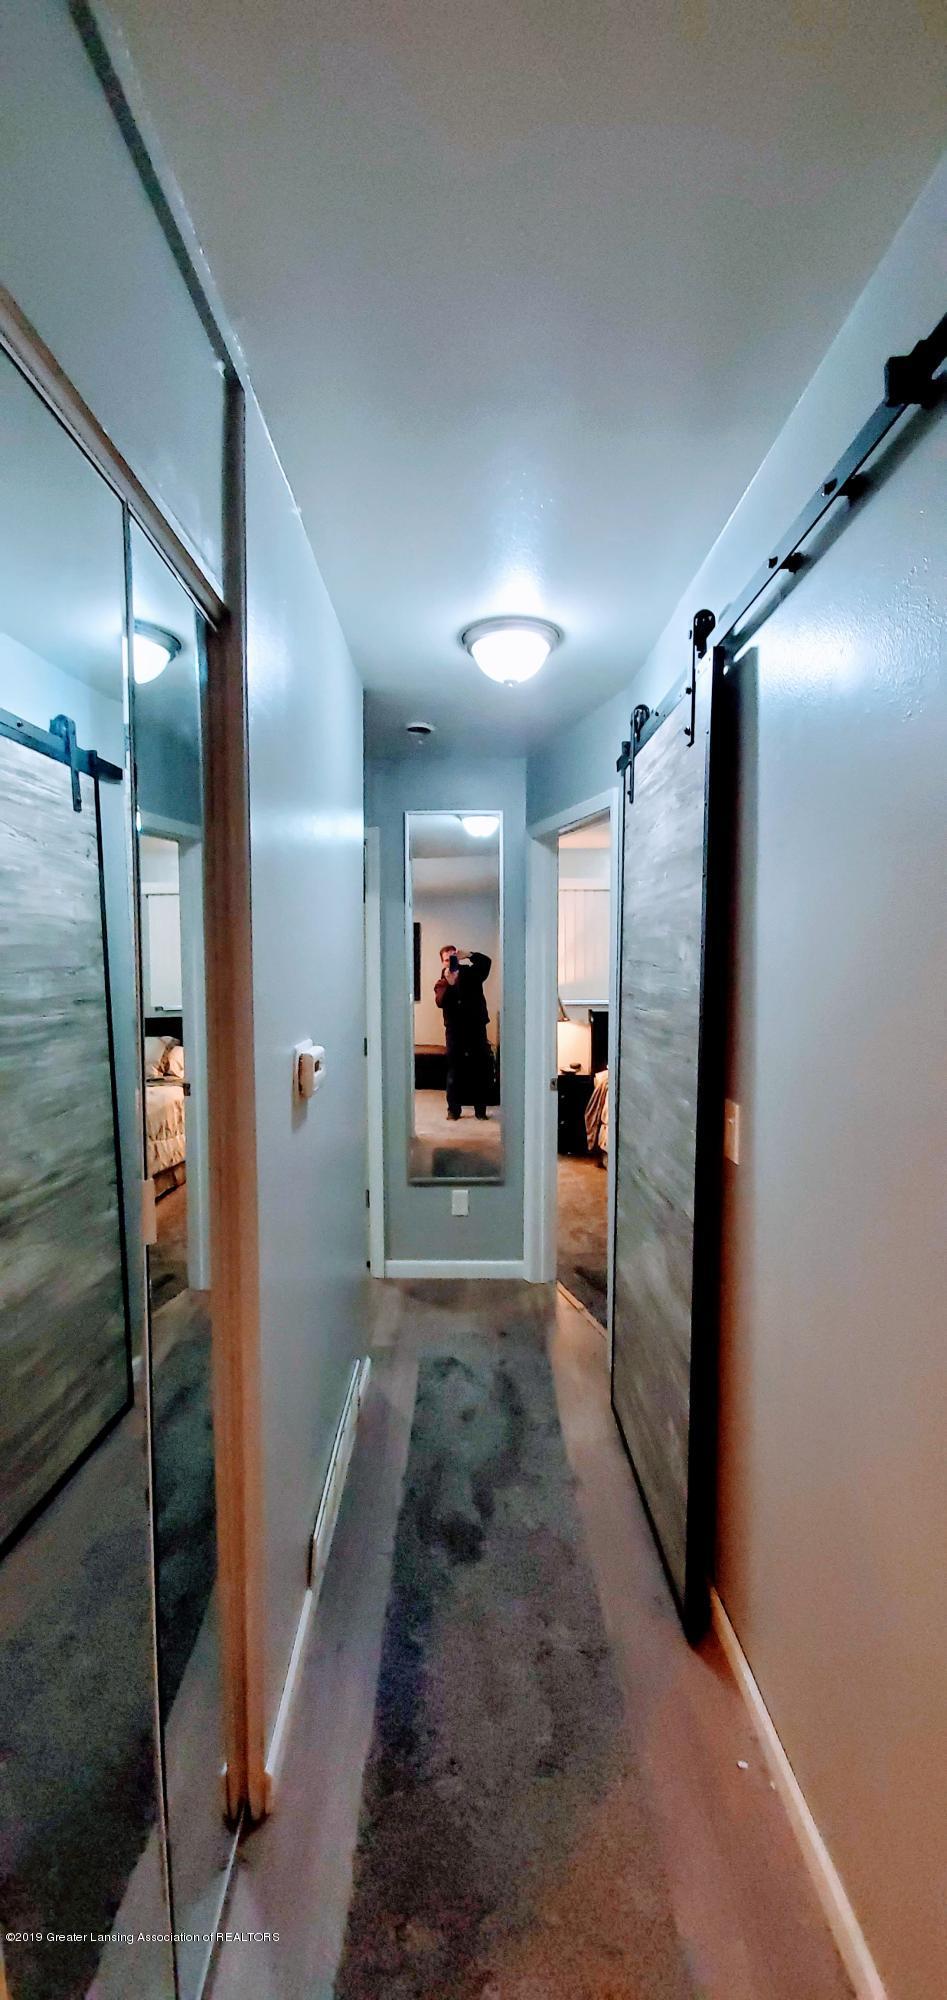 3924 Wedgewood Dr - Hallway to Bed Rooms - 6